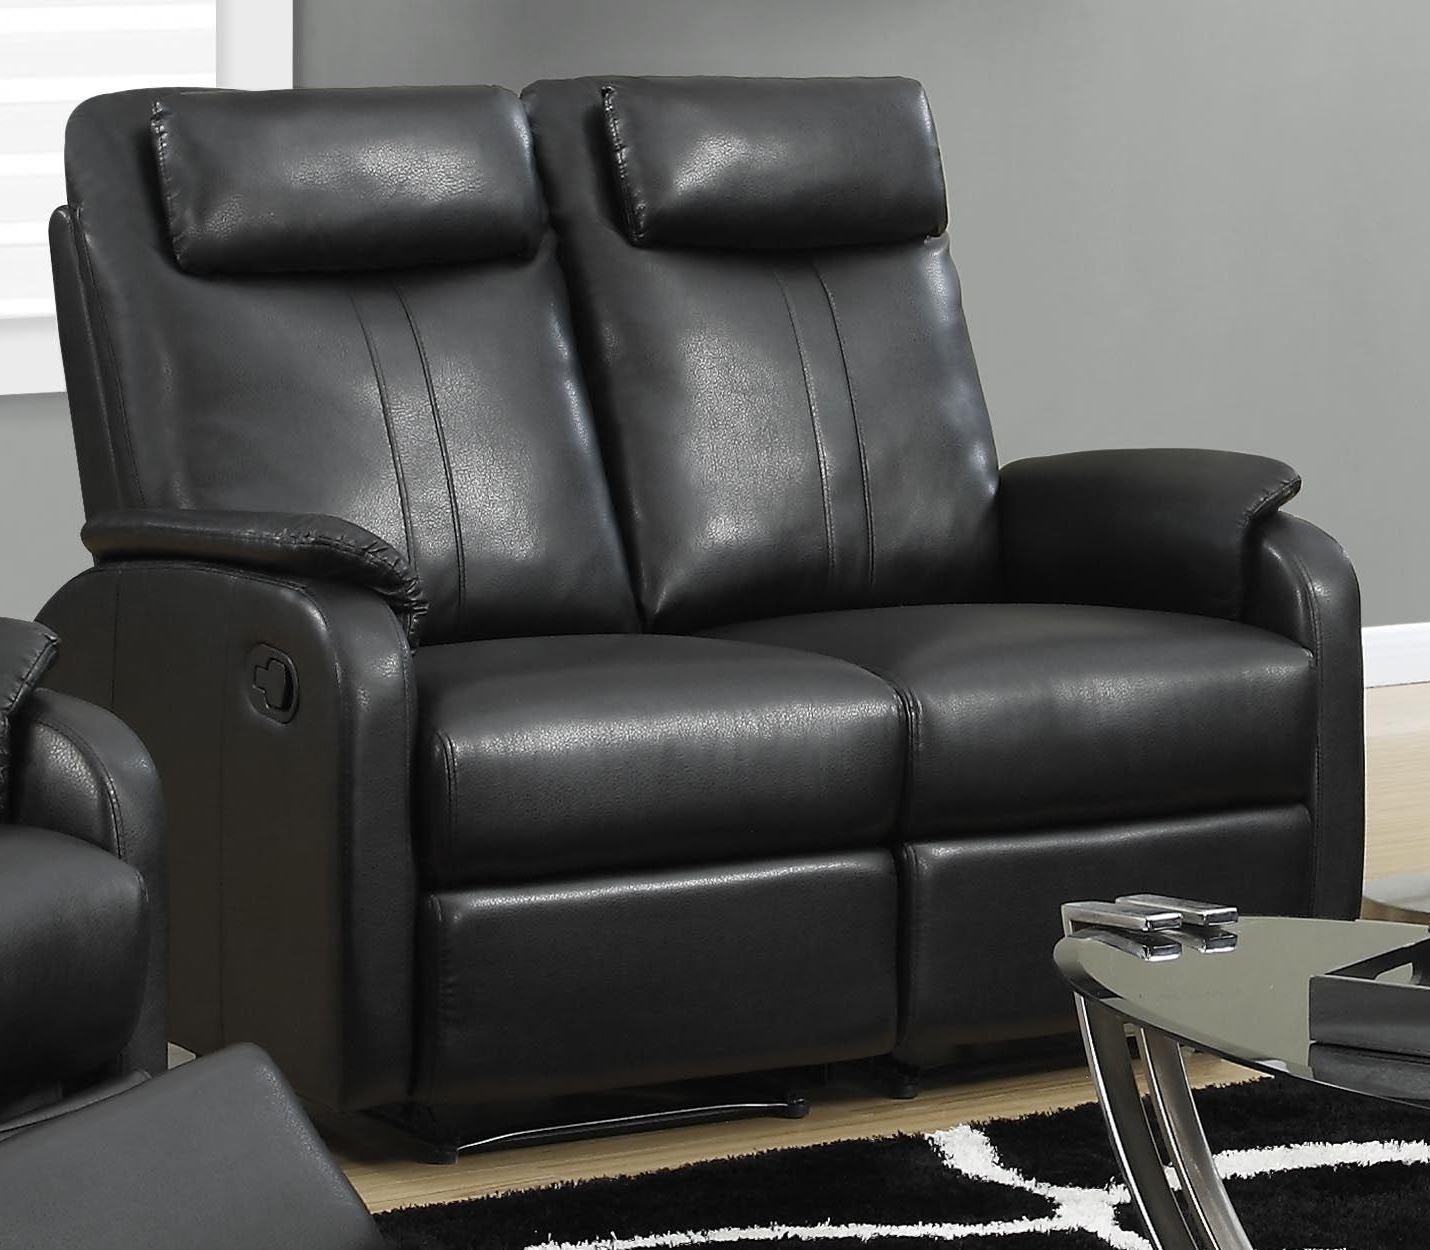 81bk 2 Black Bonded Leather Reclining Loveseat 81bk 2 Monarch